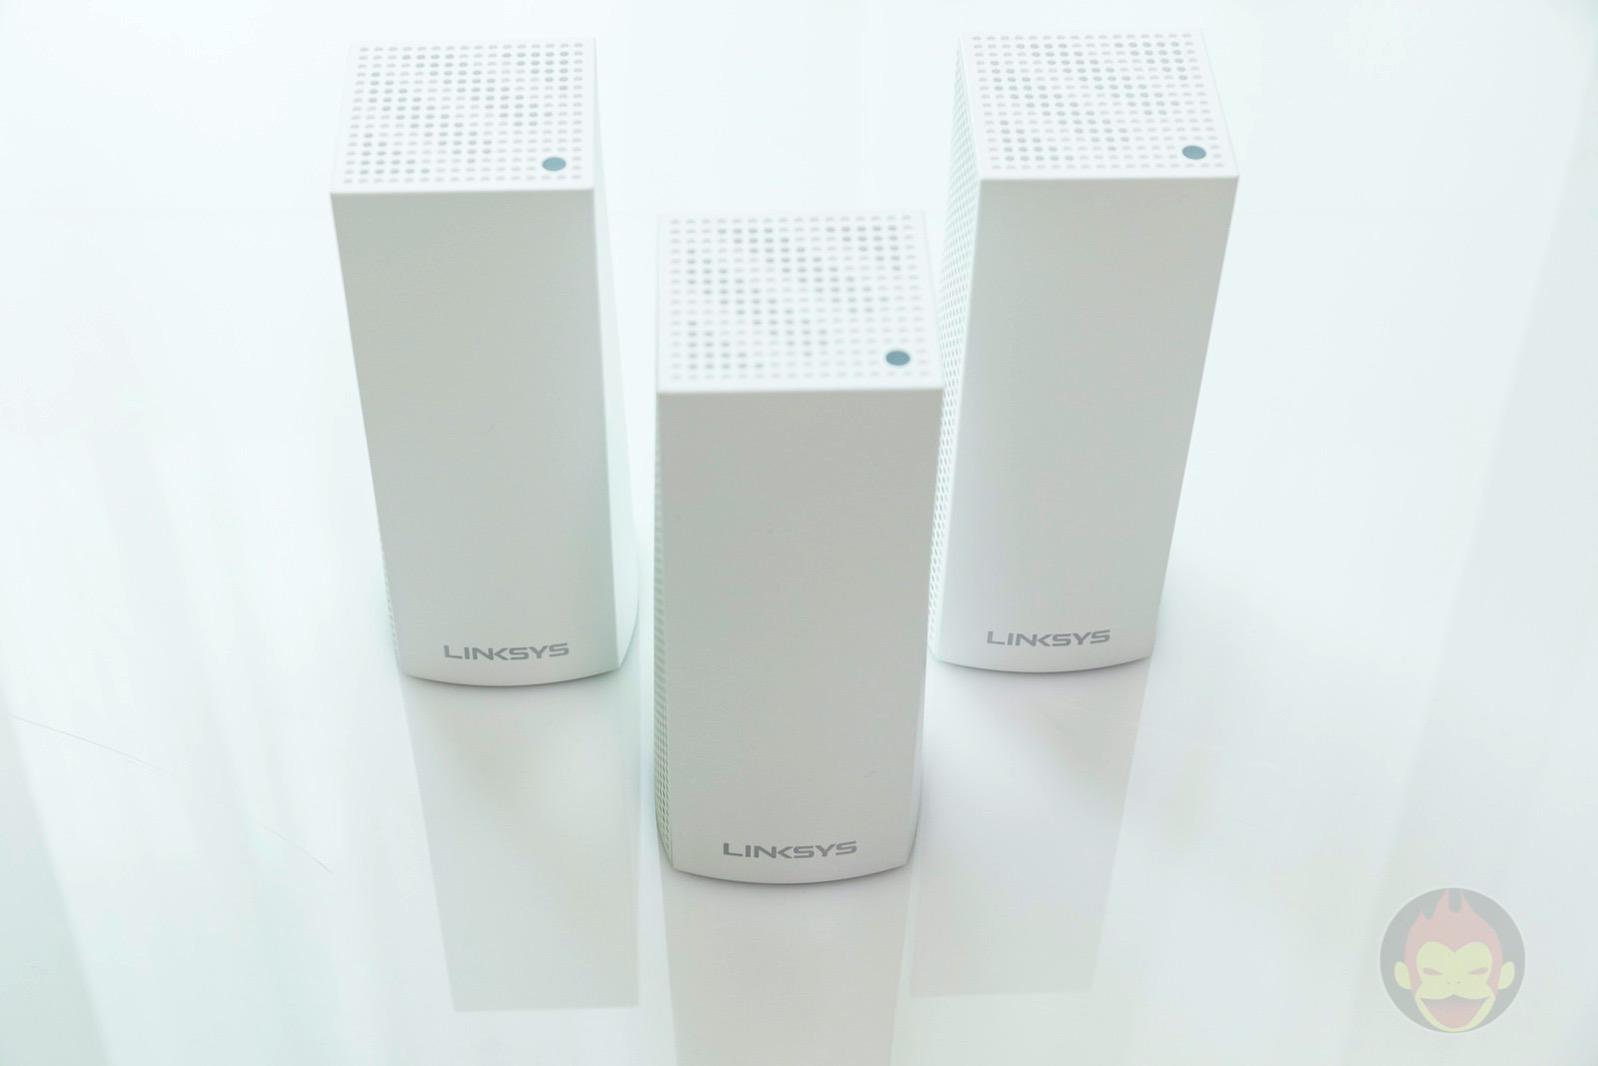 Linksys-Velop-WiFi-Router-03.jpg